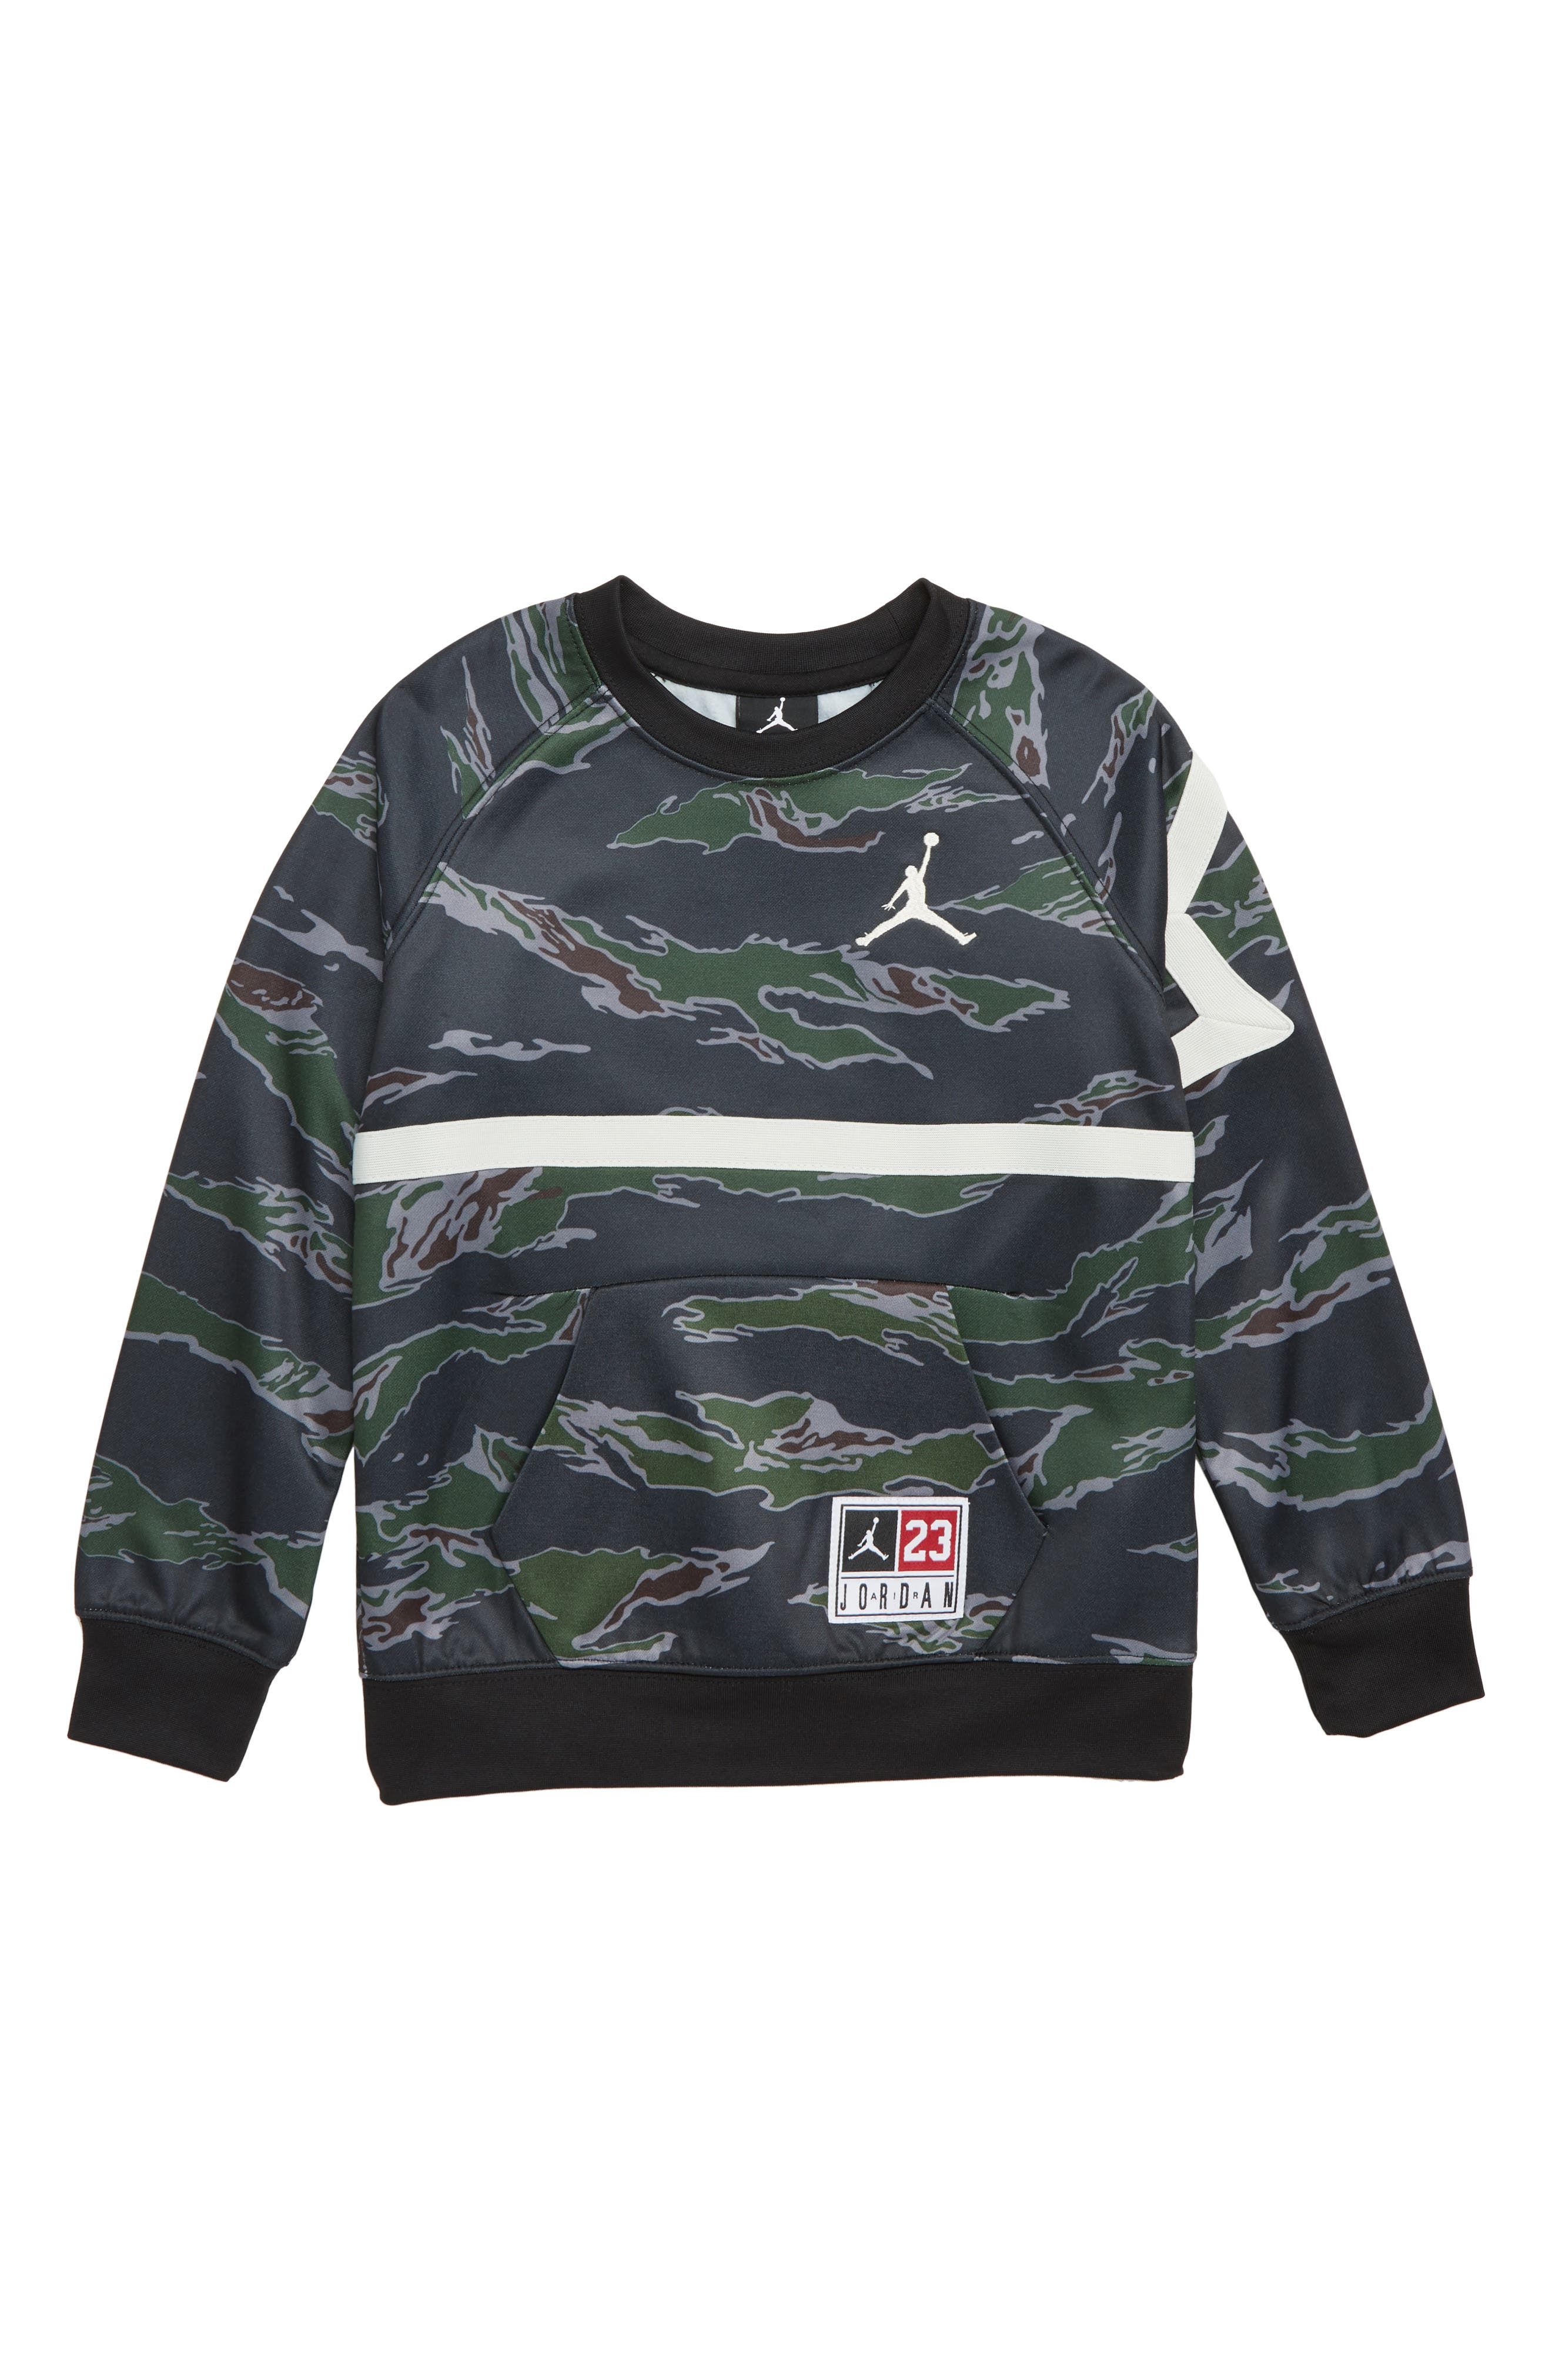 Boys Jordan Tiger Camo Sweatshirt